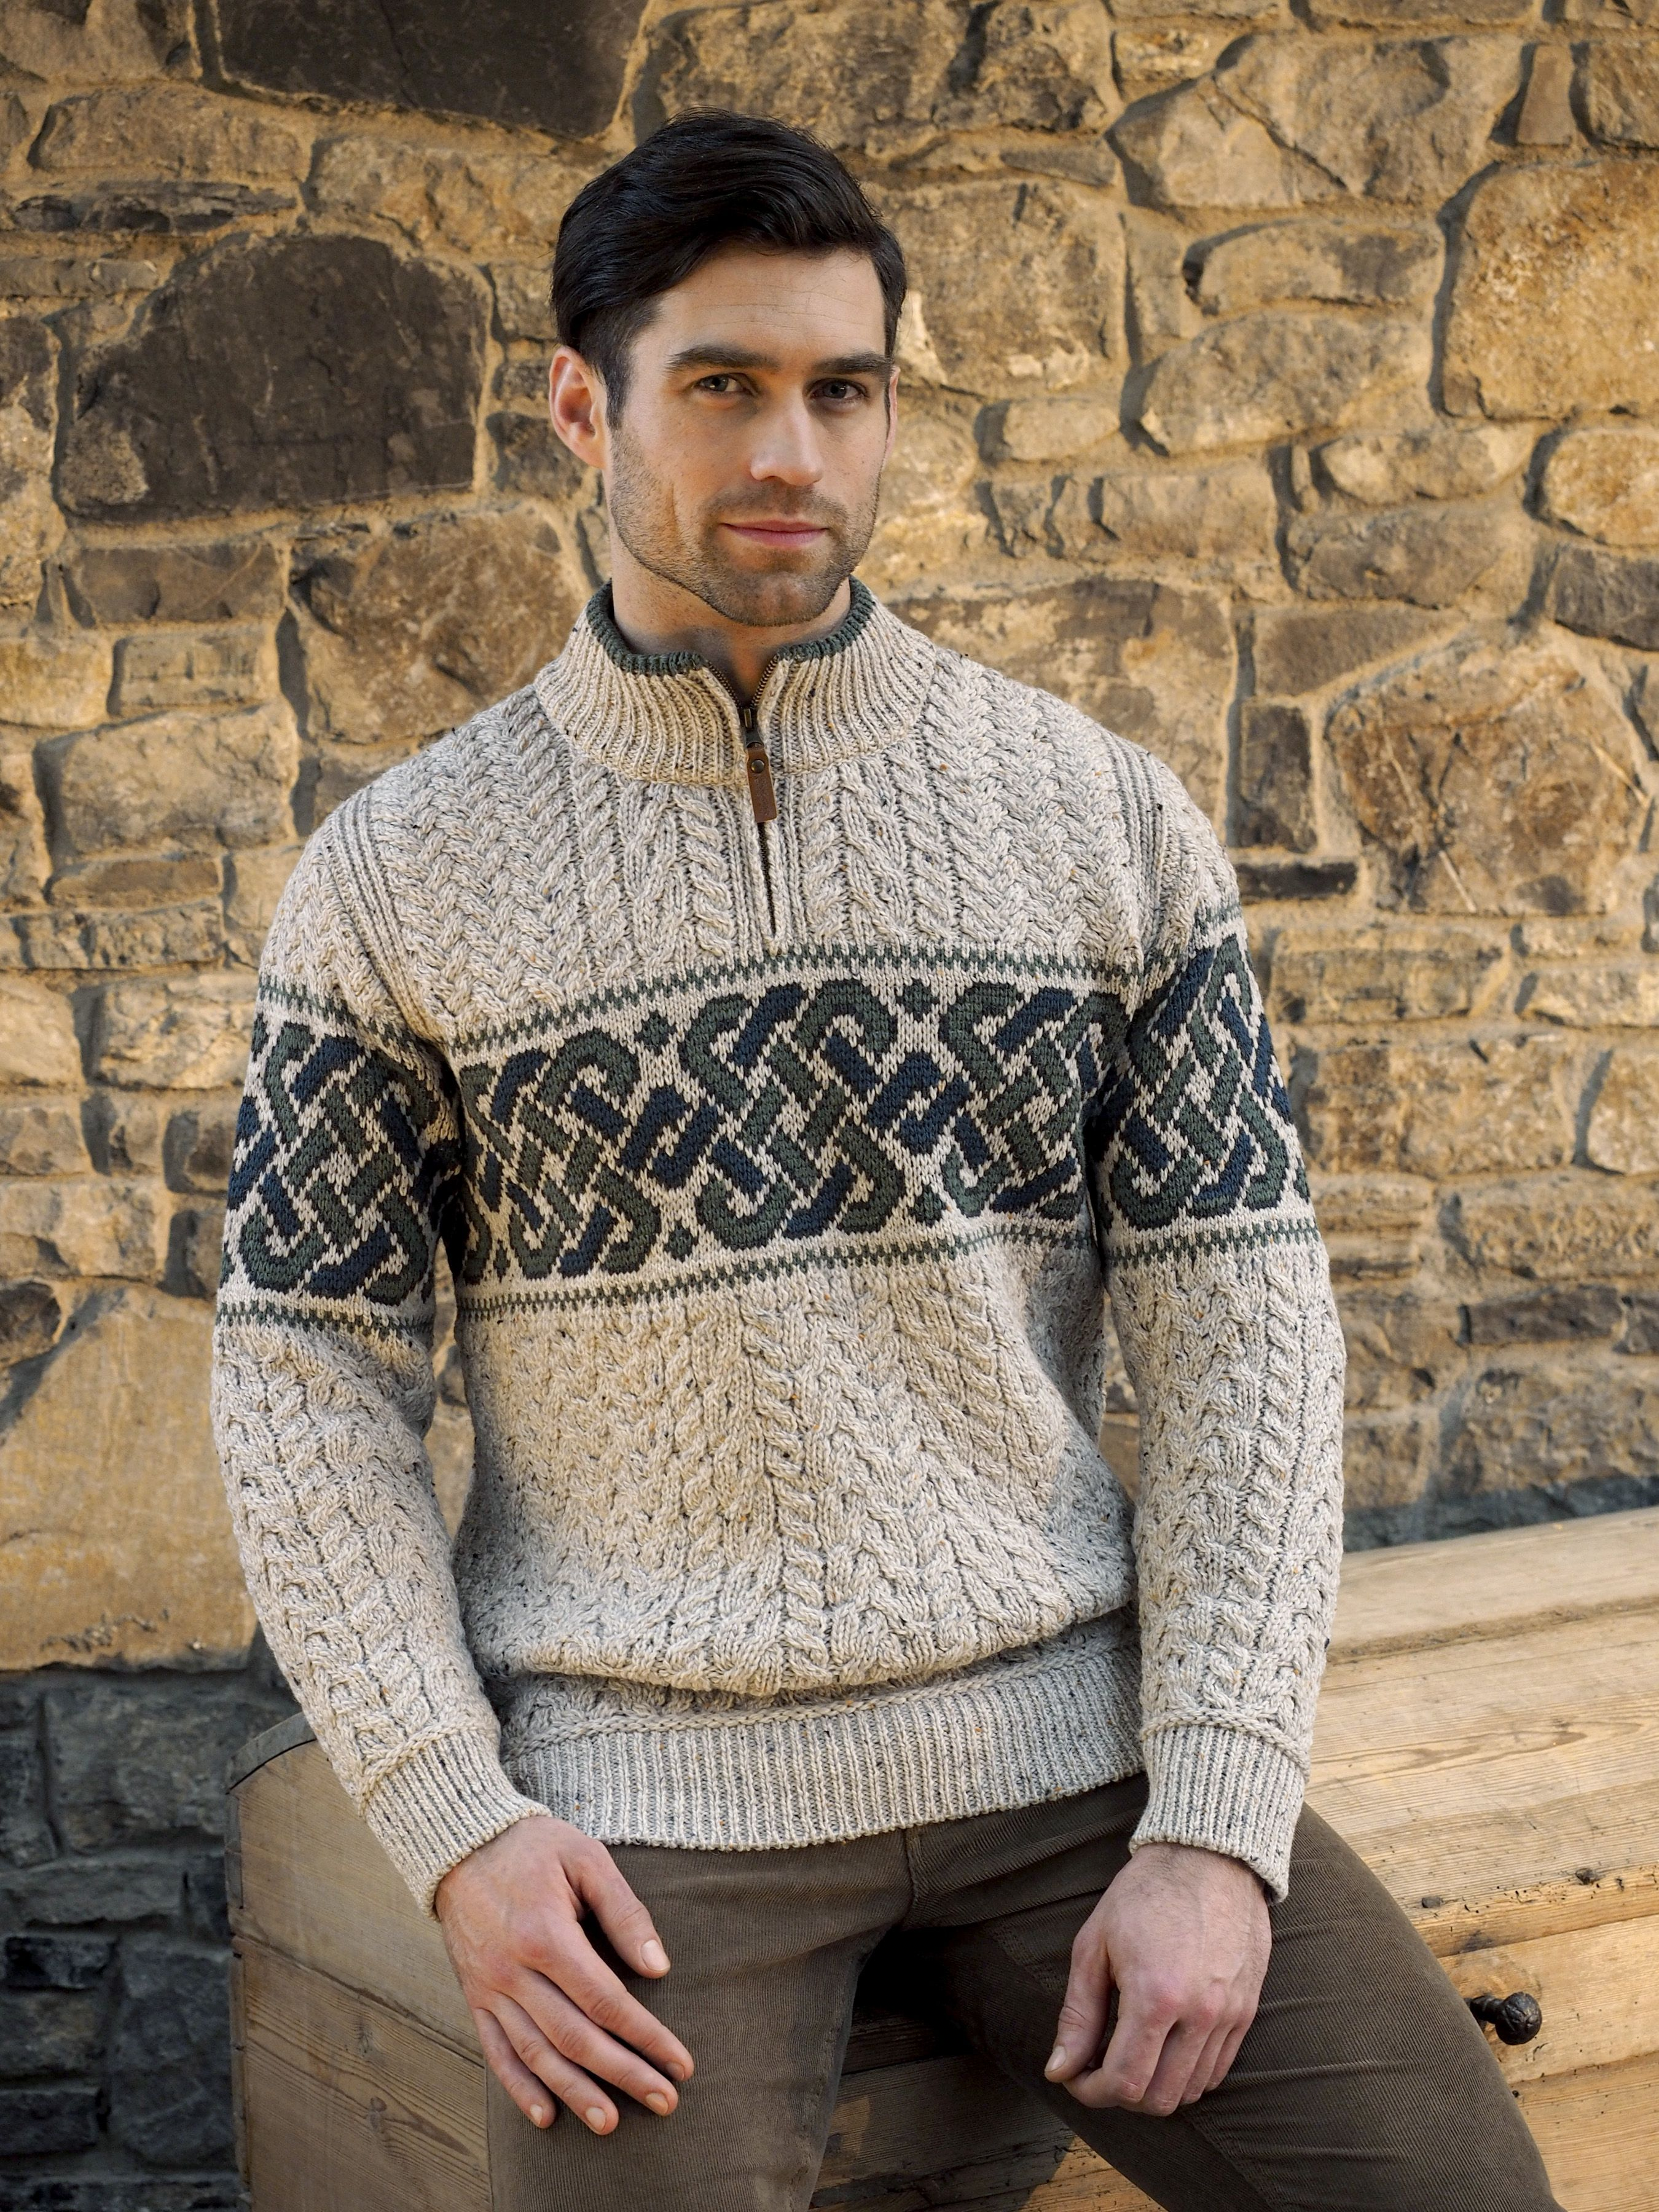 Celtic Jacquard Sweater by Natallia Kulikouskaya for